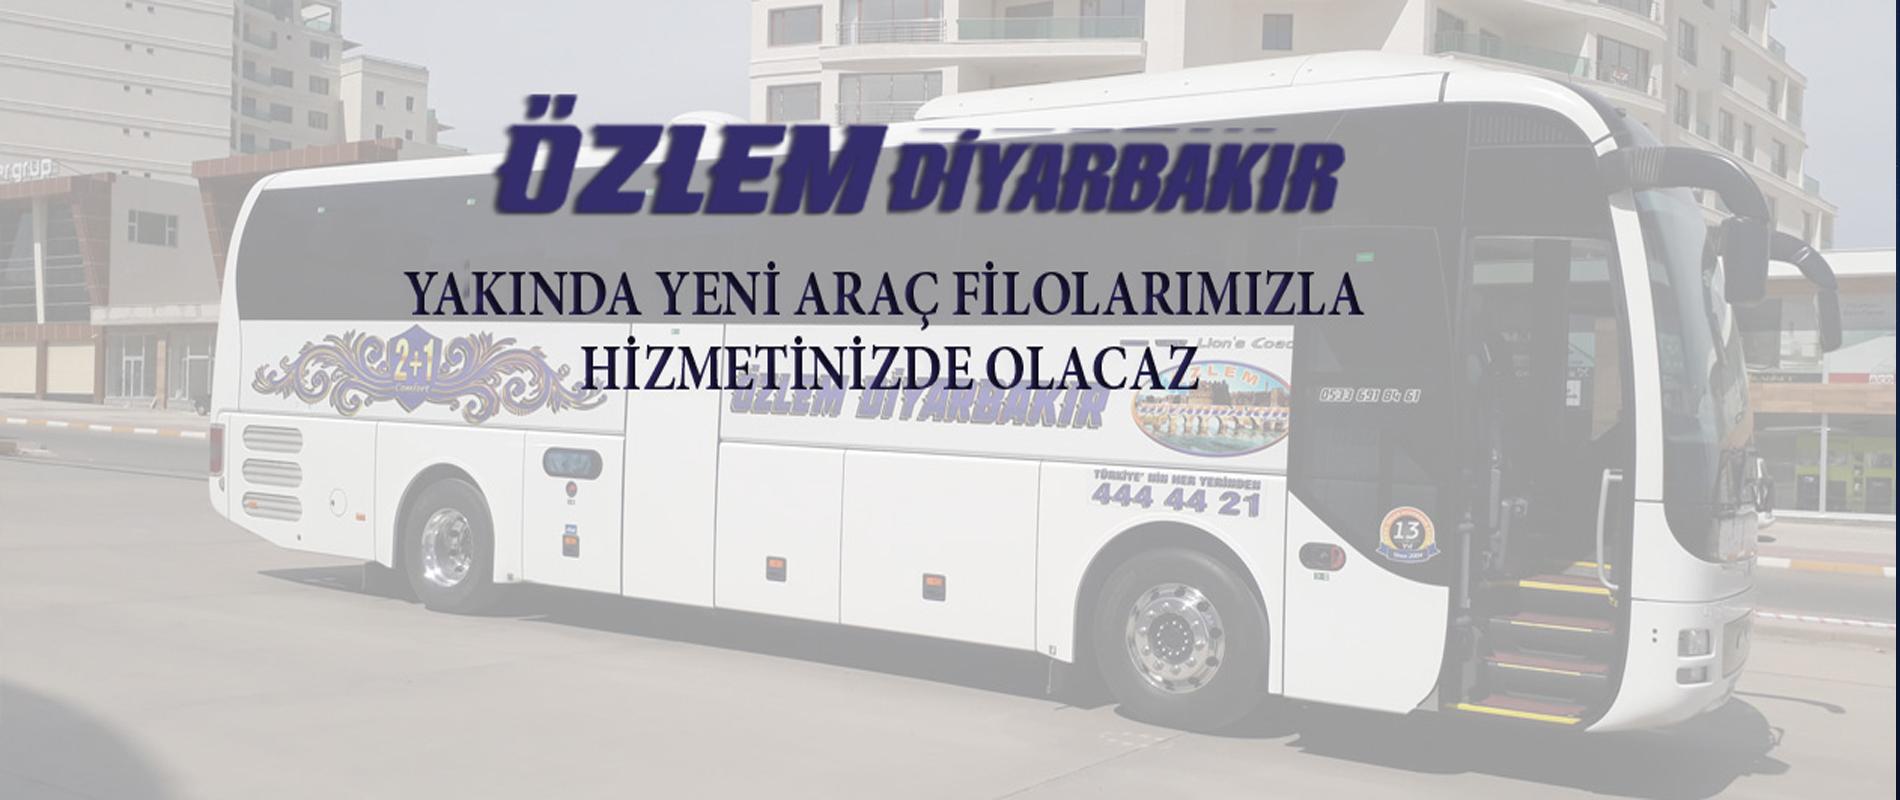 Özlem Diyarbakır - Otobüs Bileti